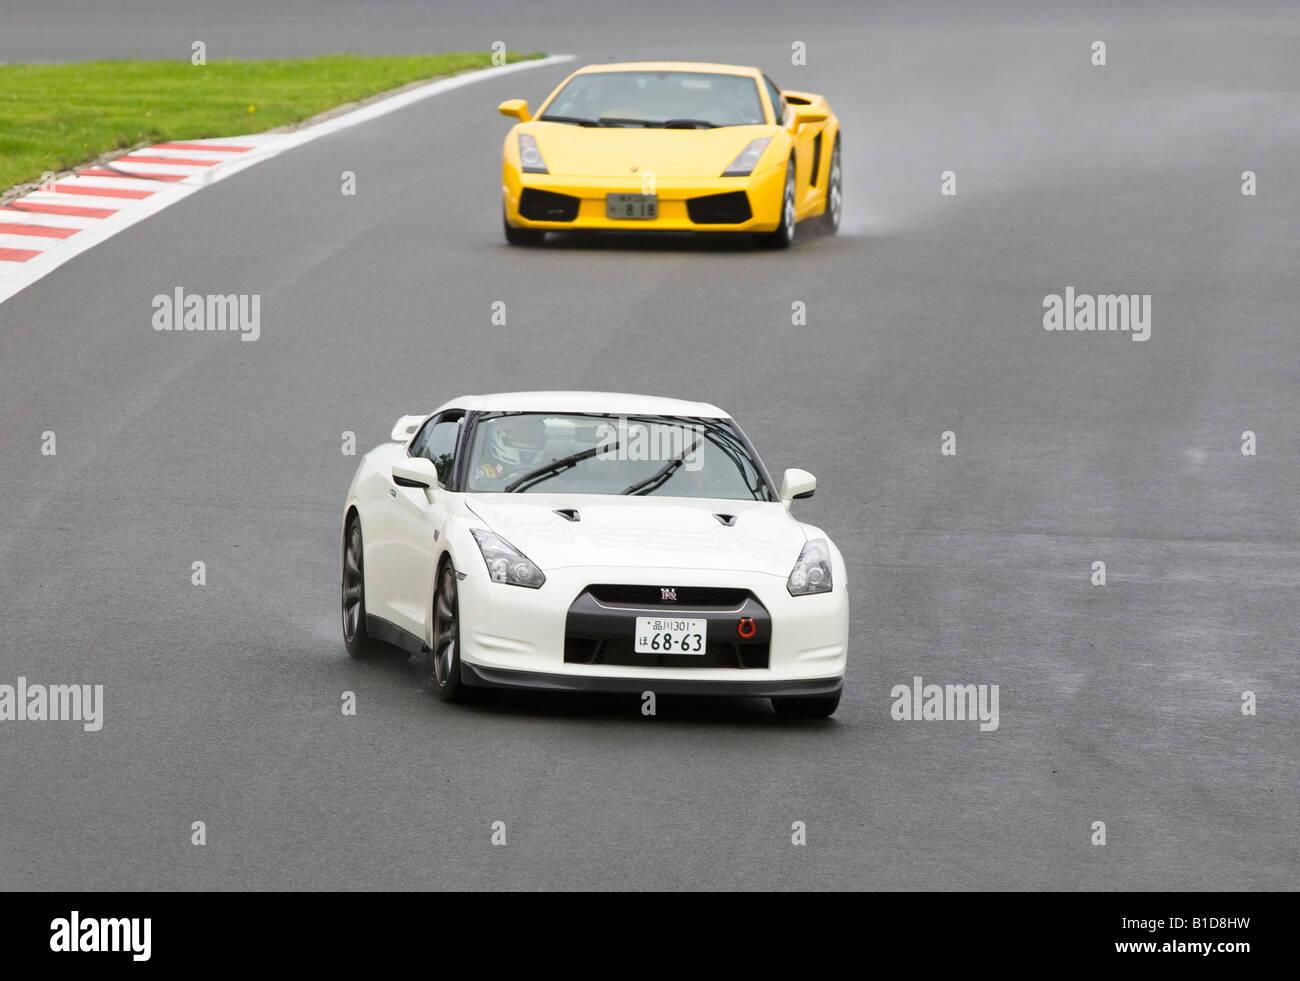 Yellow Lamborghini Gallardo Chasing A White Nissan Skyline Gtr At